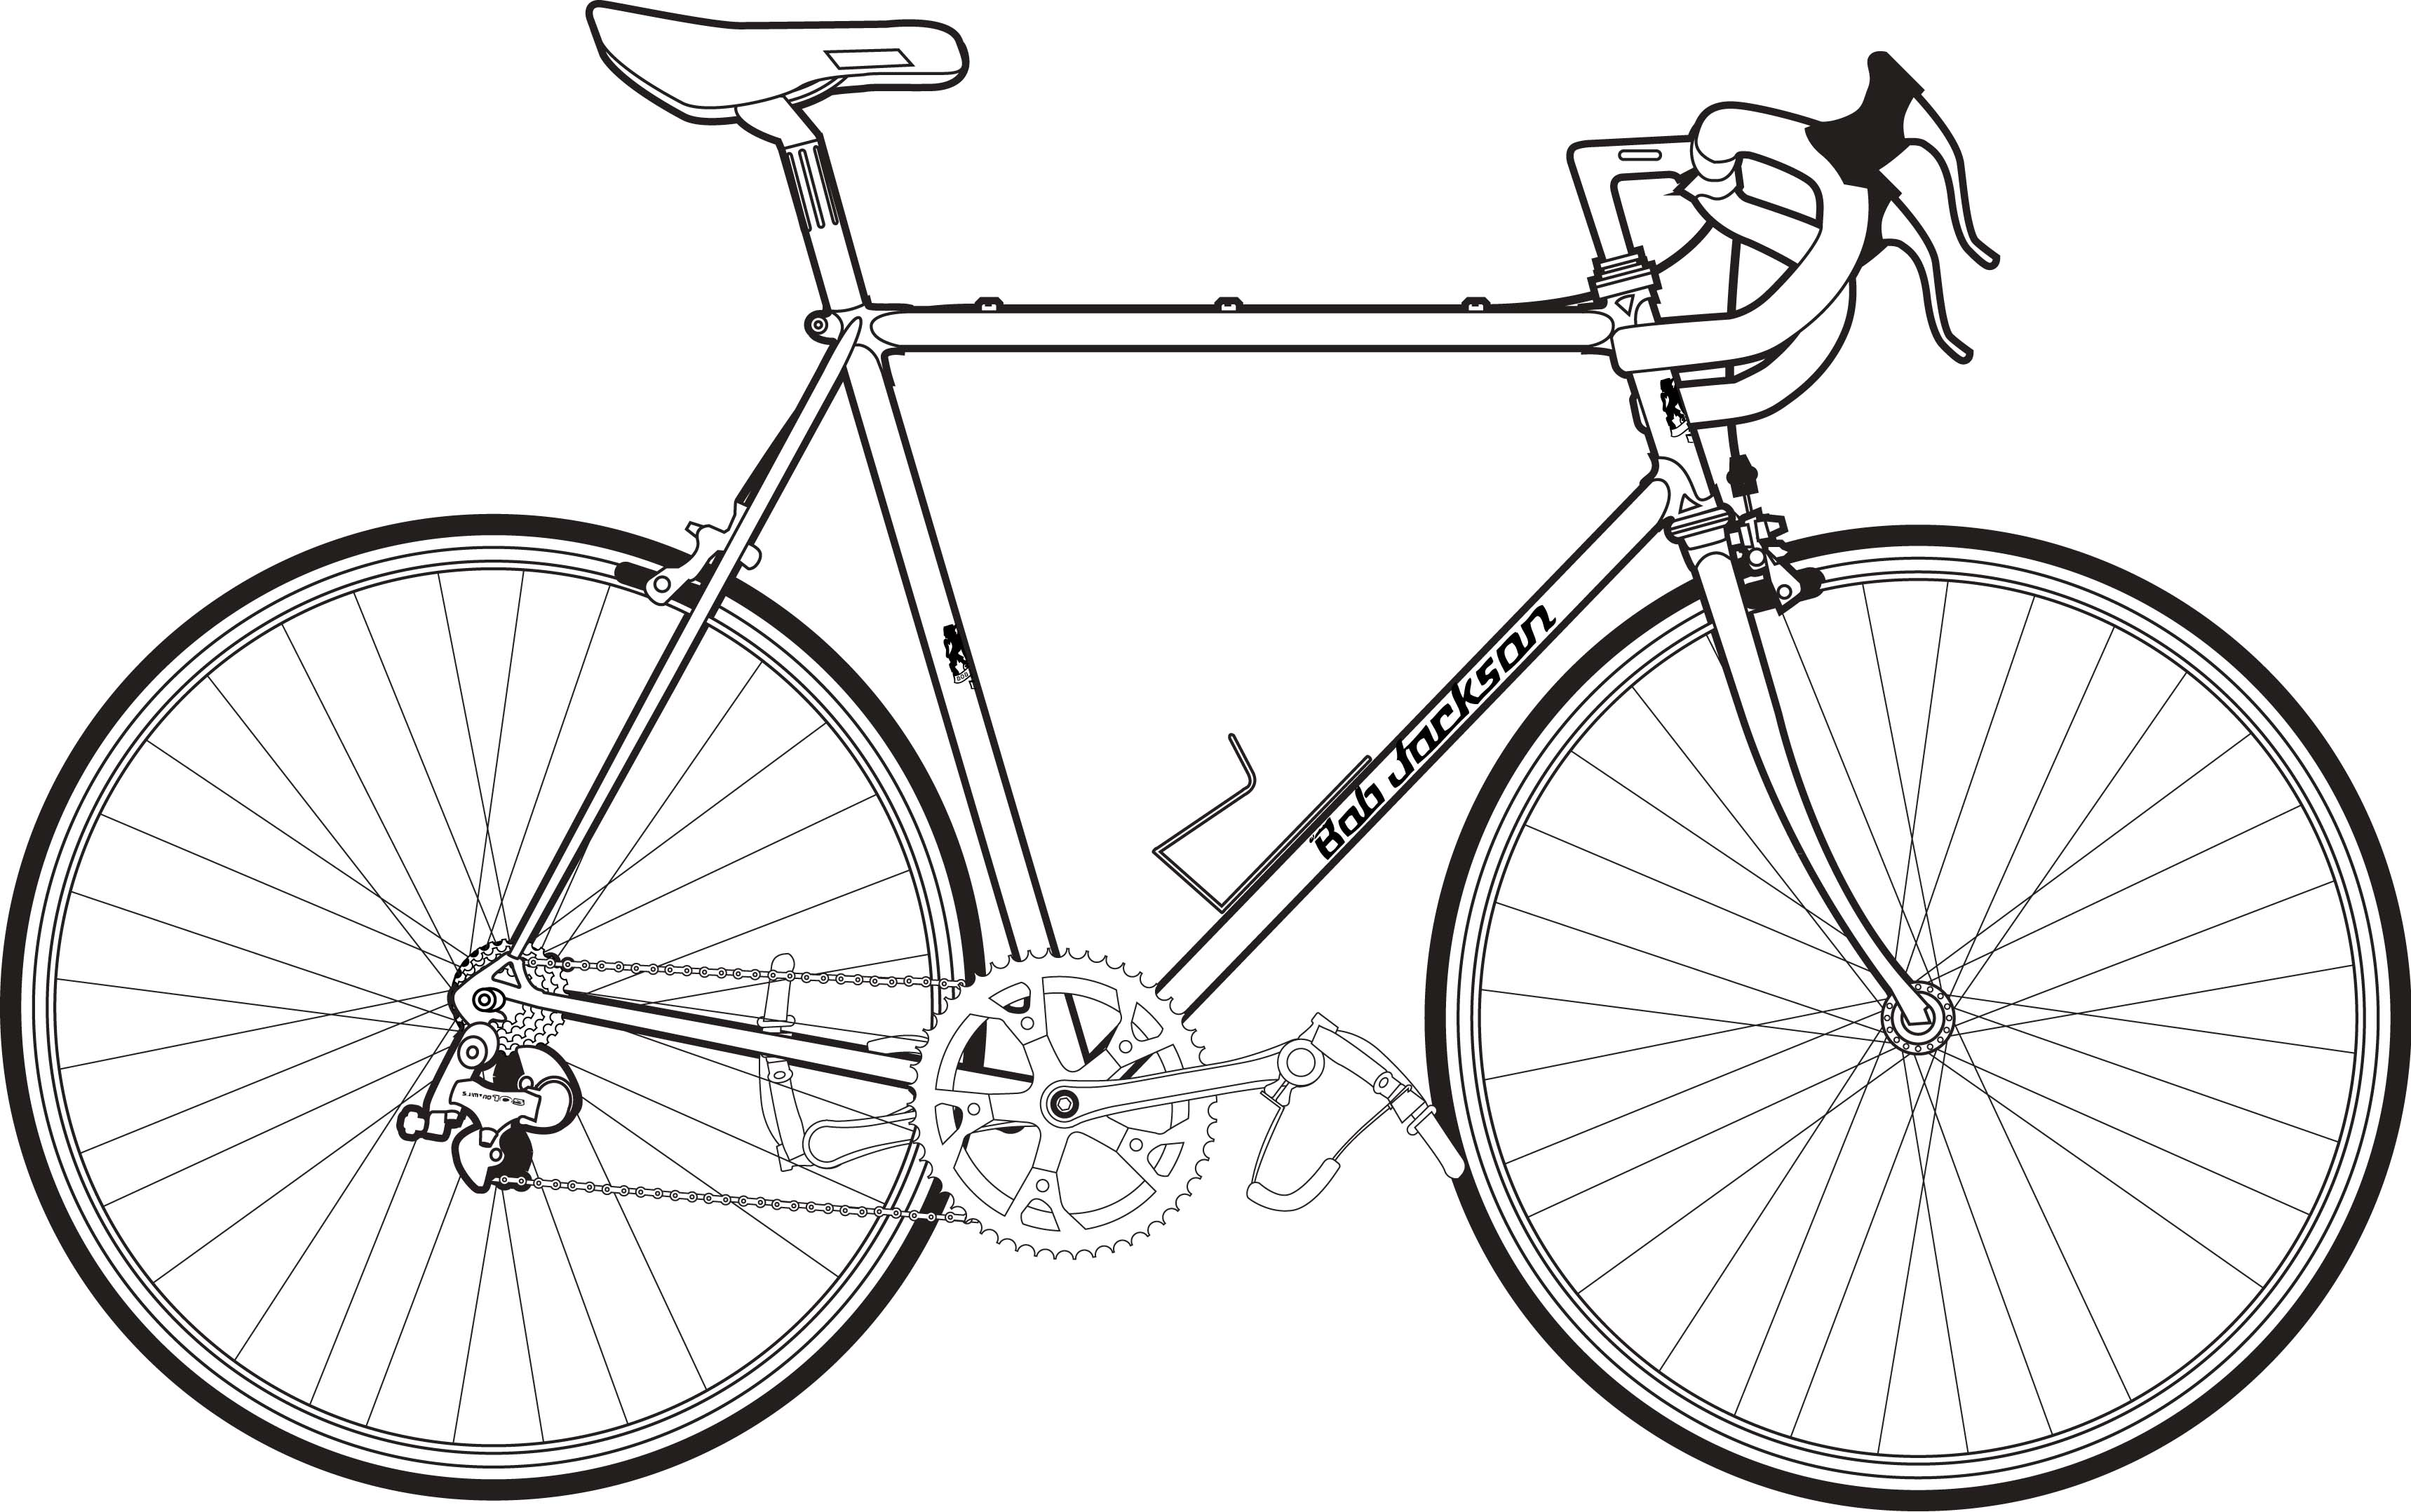 Line Drawing Bike : Road bike bicycle line drawing sketch coloring page